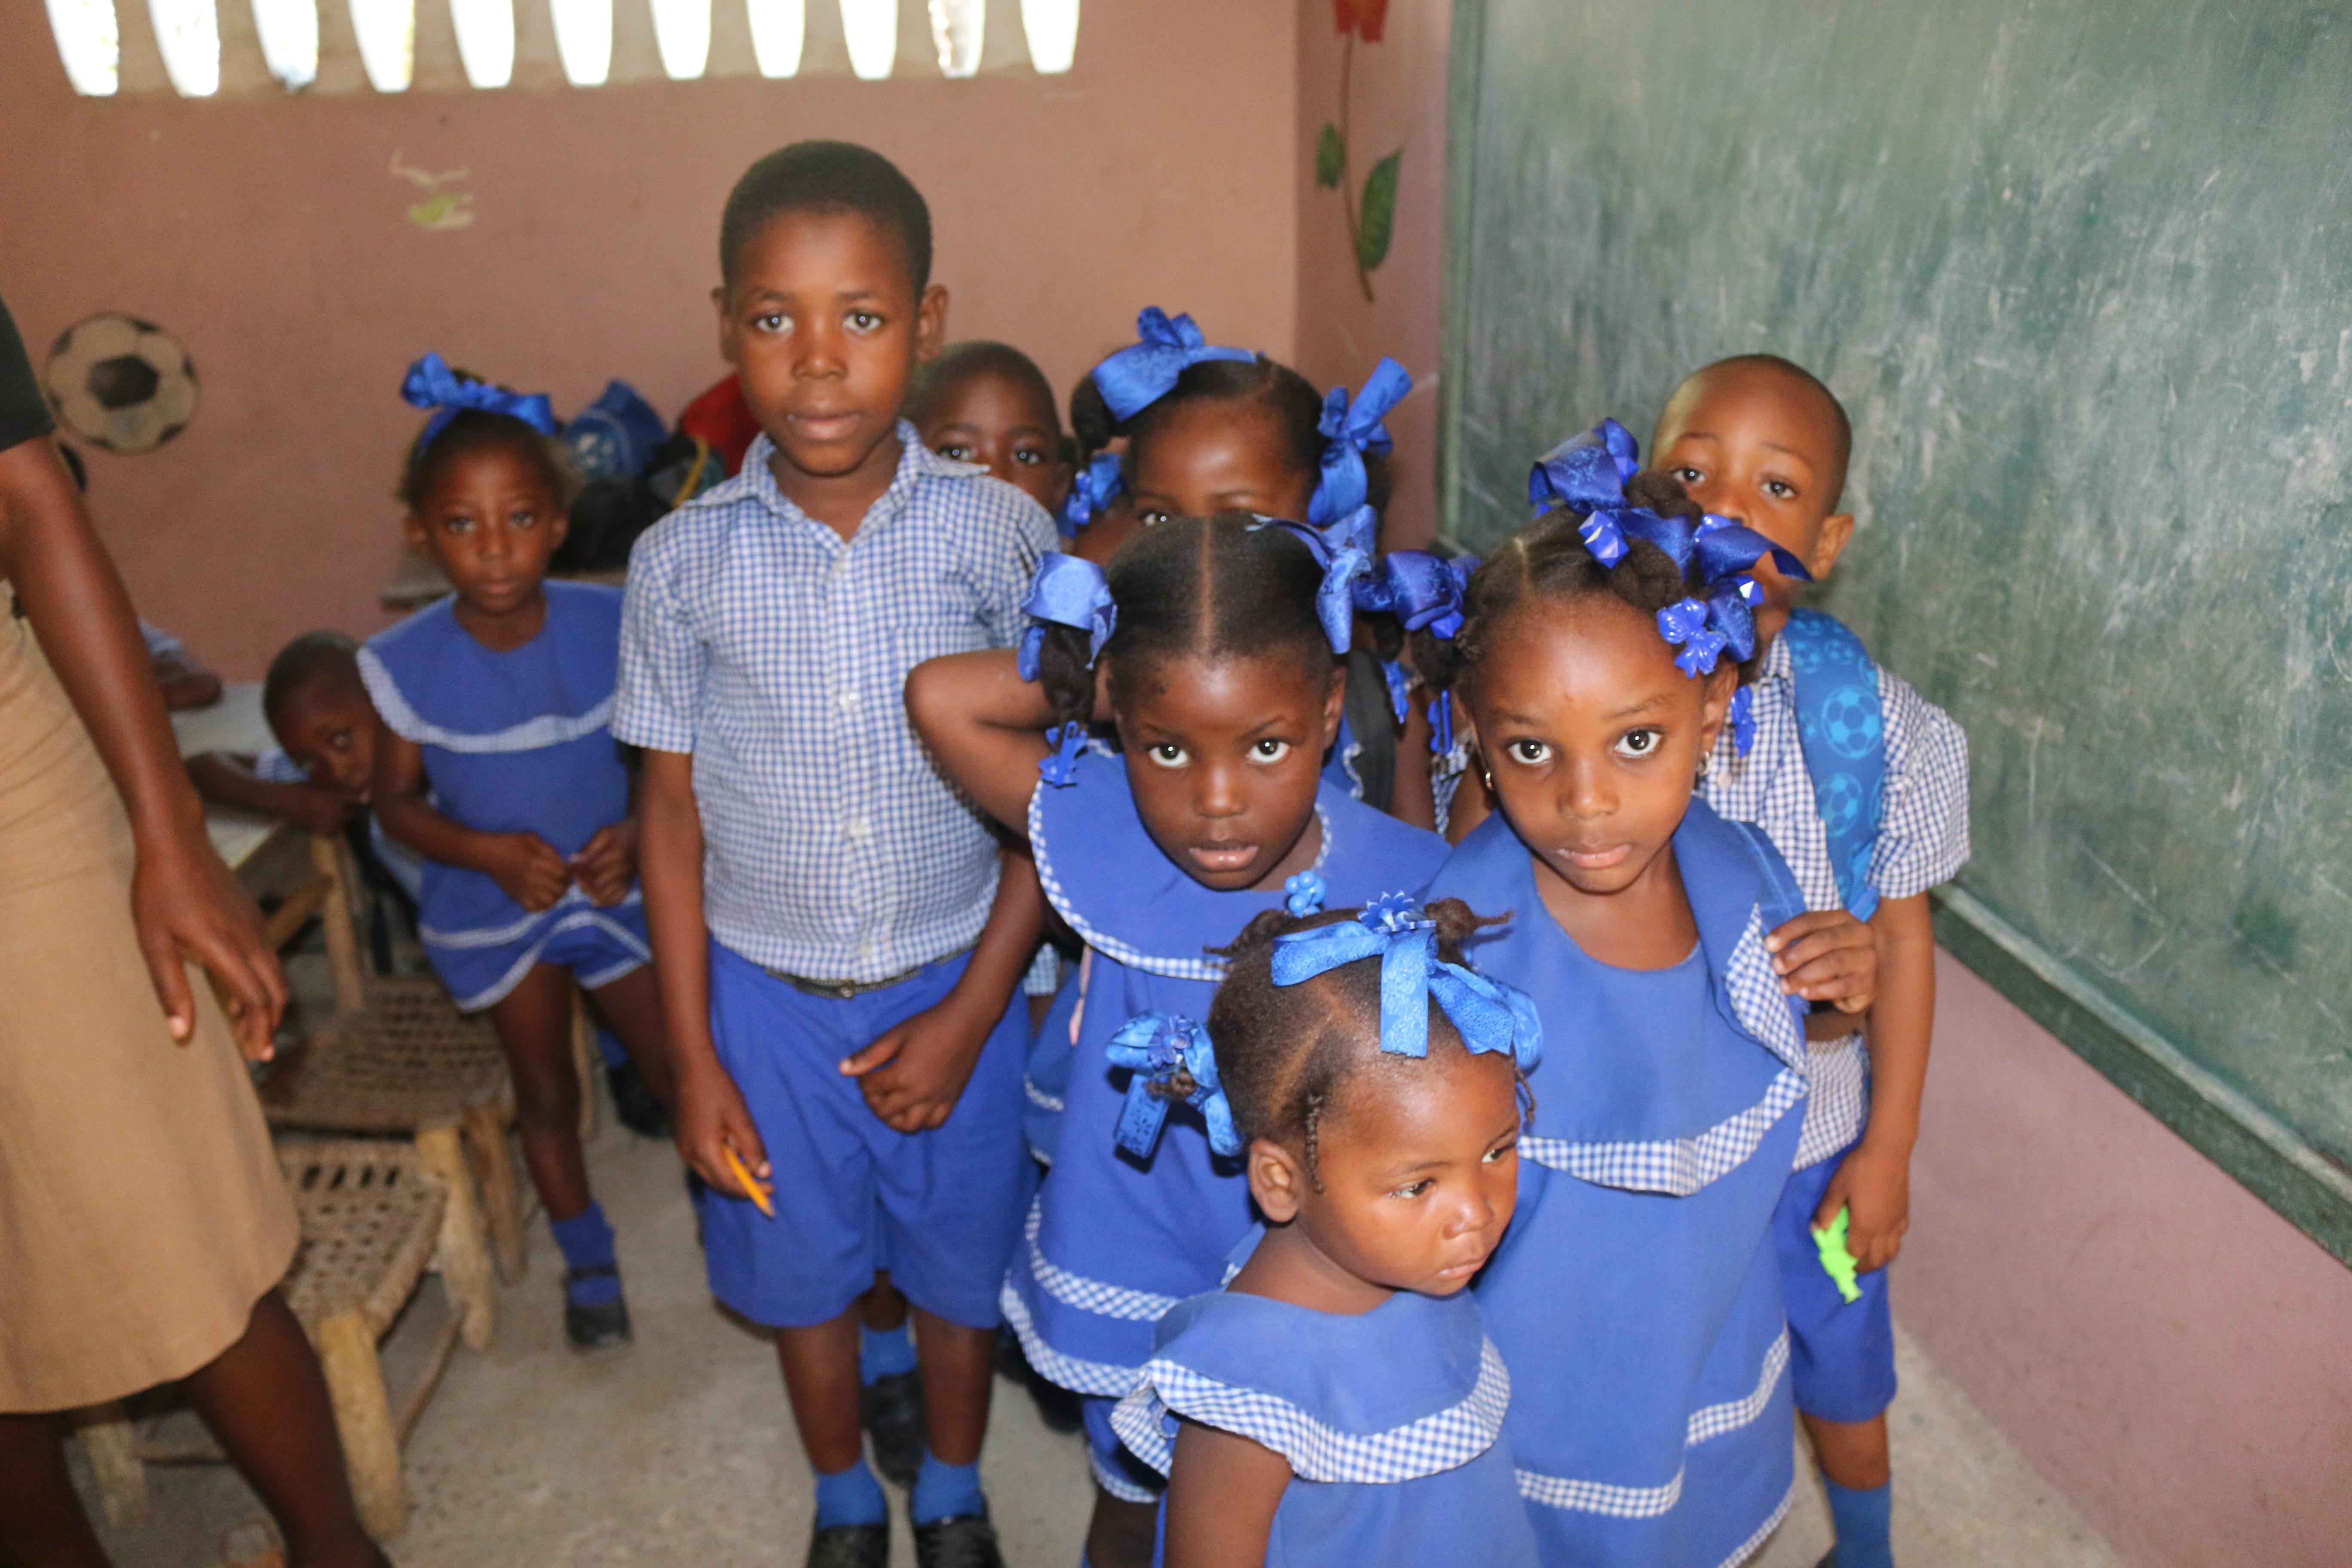 Vitamin Distribution to Children in Haiti